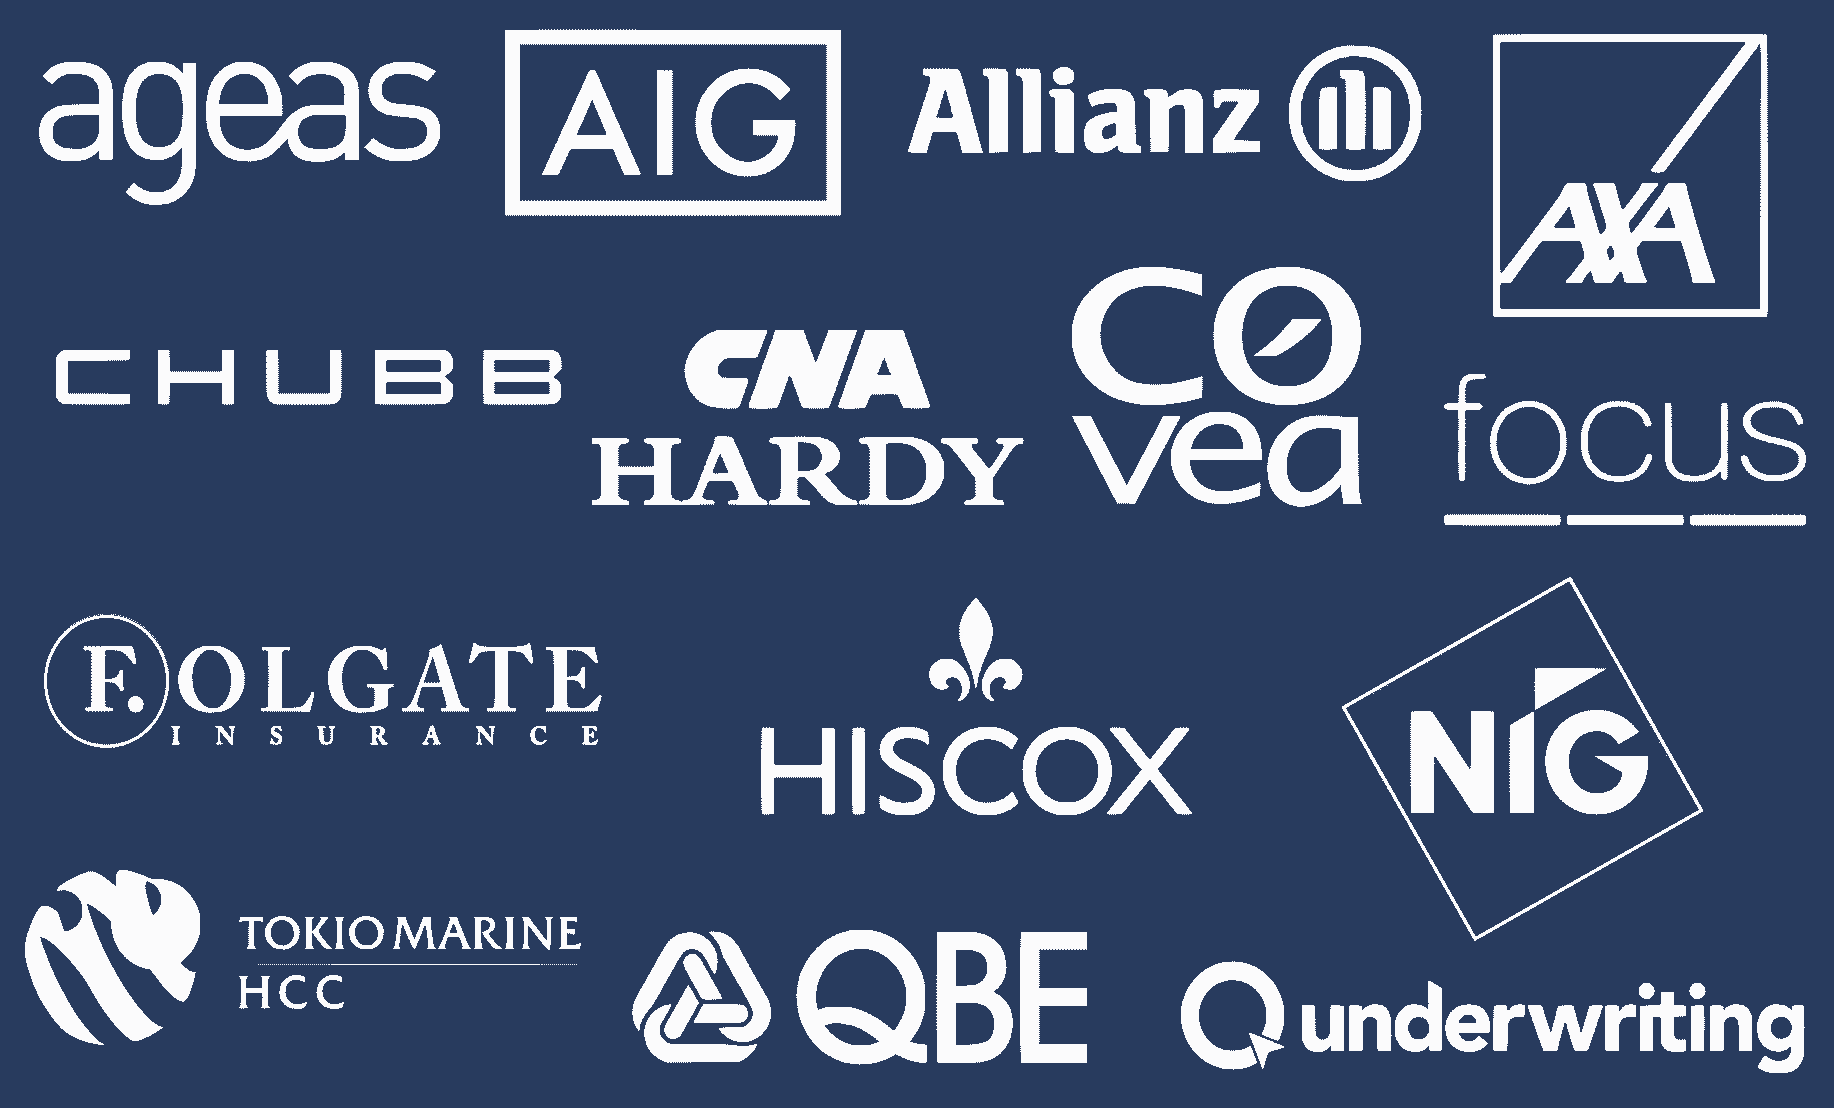 Leading contractors all risk providers include: Ageas, AIG, Allianz, AXA, Chubb, CNA Hardy, Covea, Focus, Folgate, Hiscox, NIG, Tokio Marine, QBE and Q Underwriting.